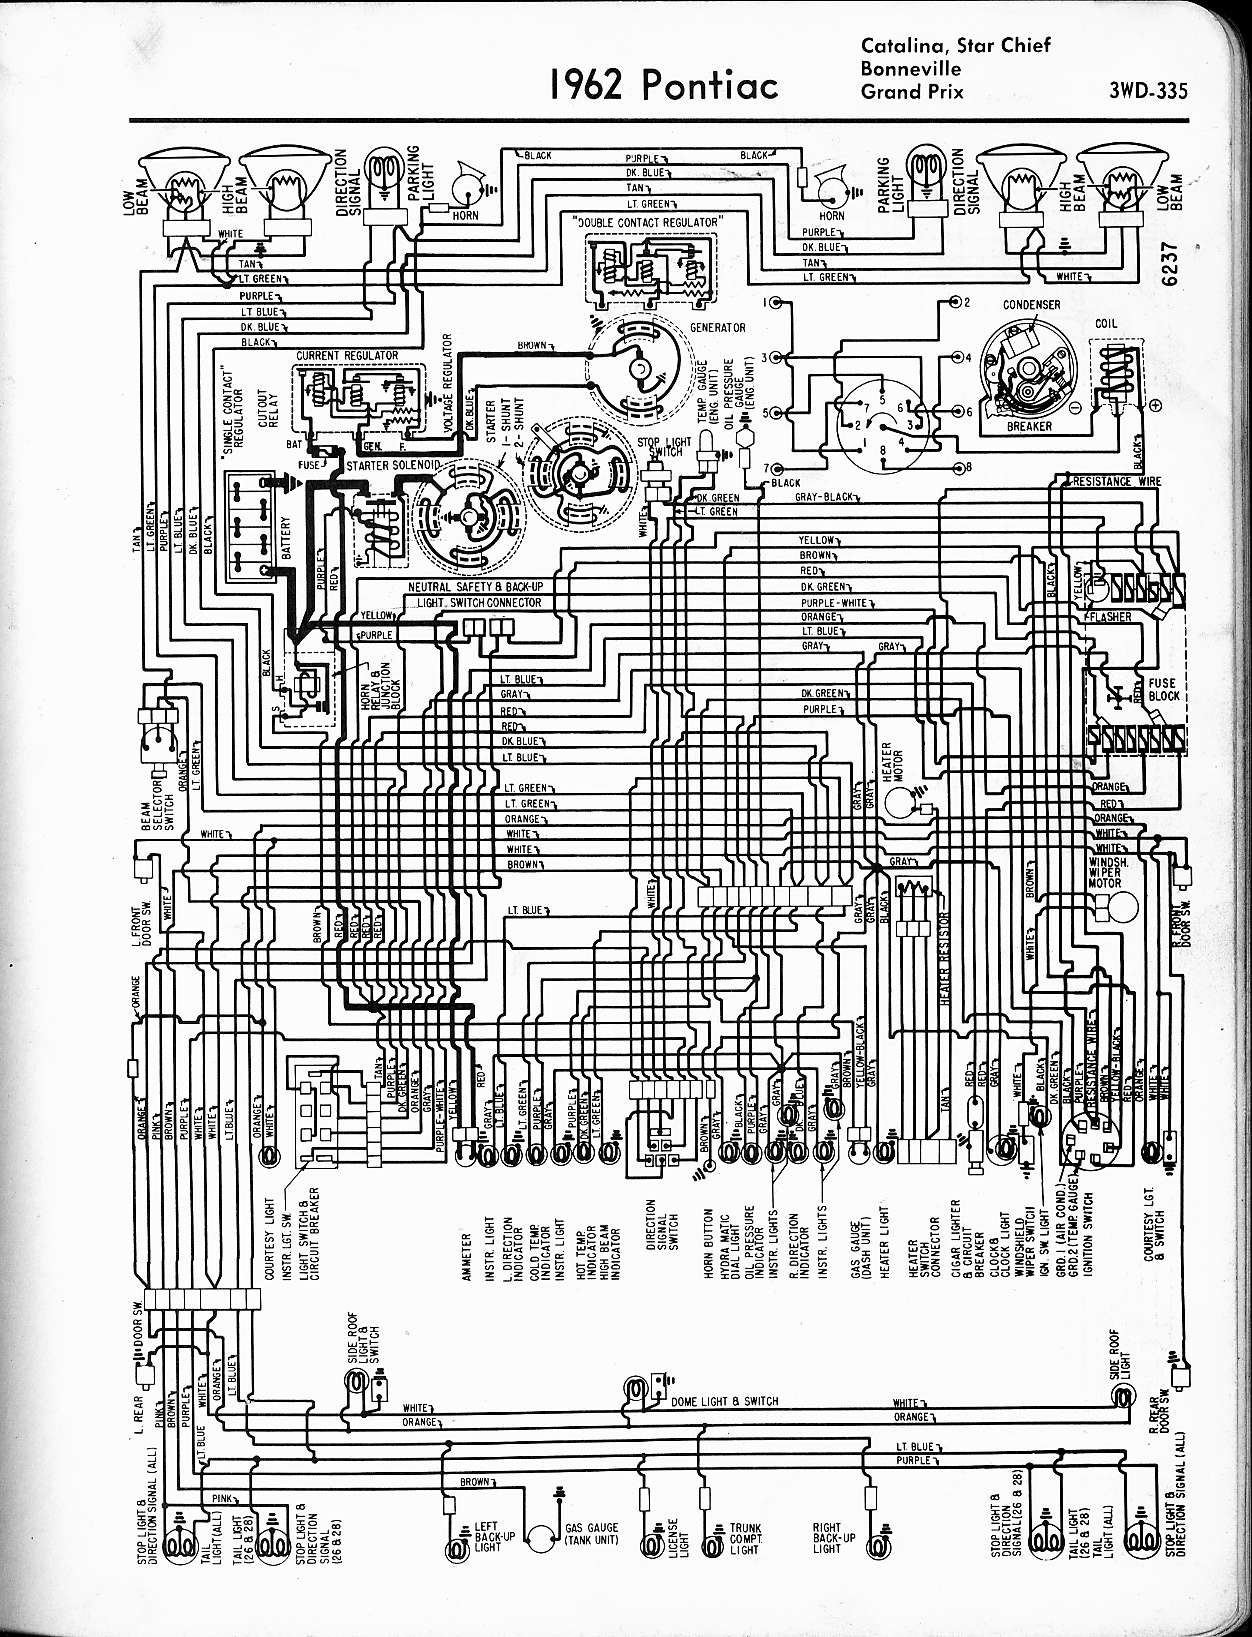 Fantastic 1958 Pontiac Chieftain Wiring Diagram Wiring Diagram Wiring Cloud Faunaidewilluminateatxorg